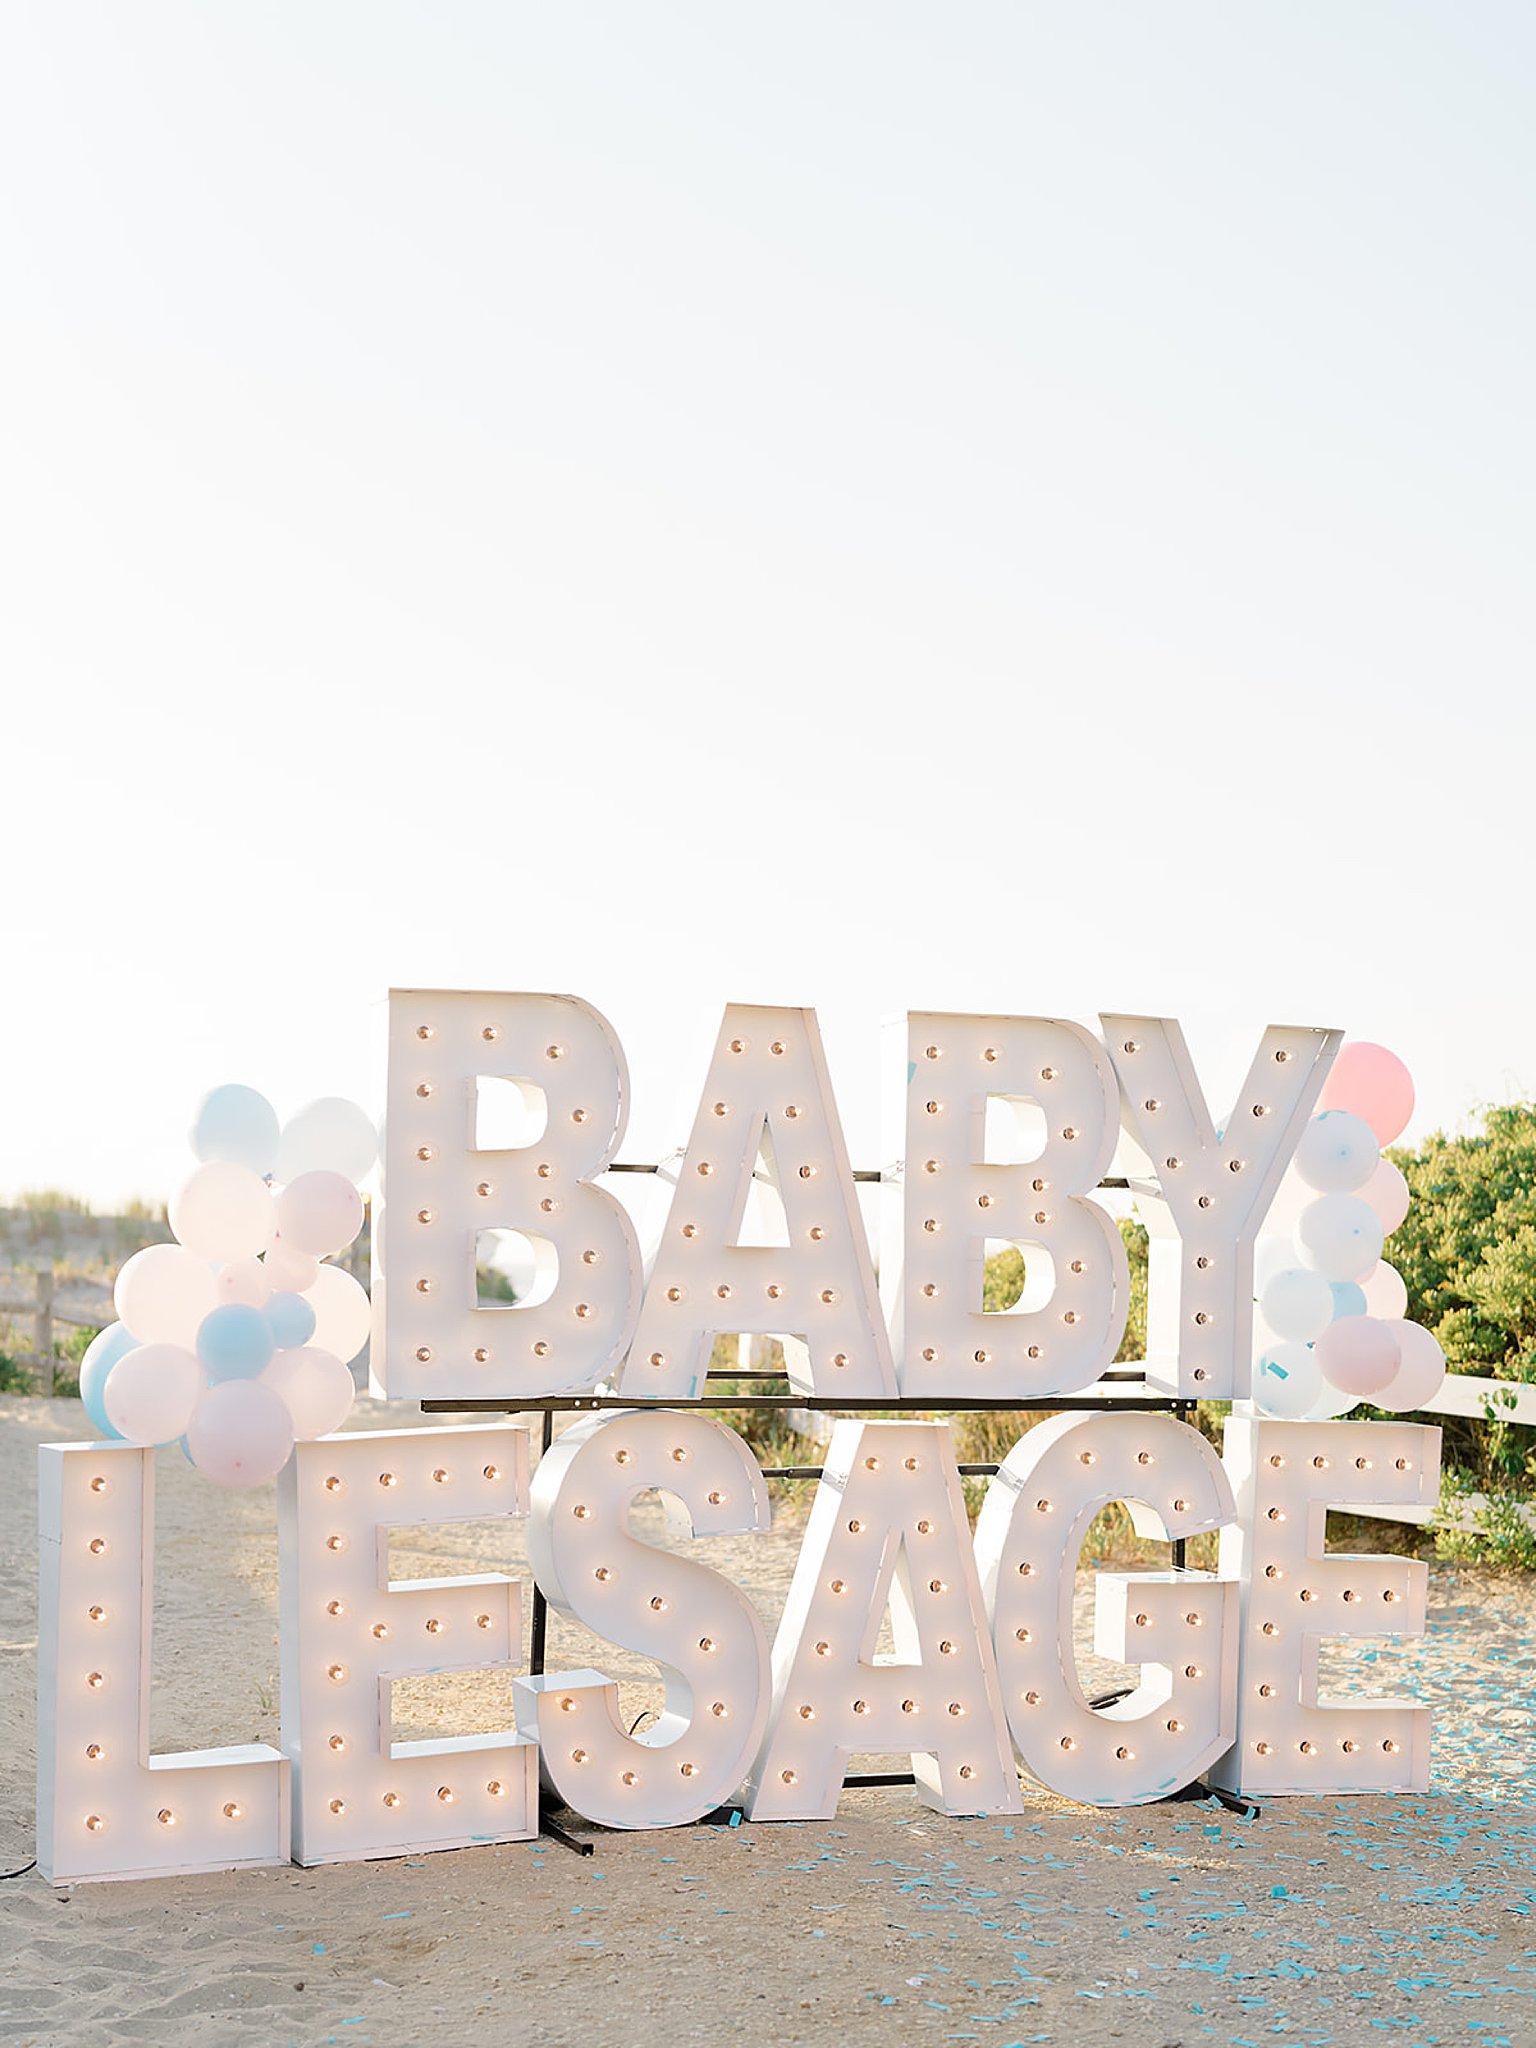 Ocean City NJ Gender Reveal Pregnancy Photography by Magdalena Studios 0000 1